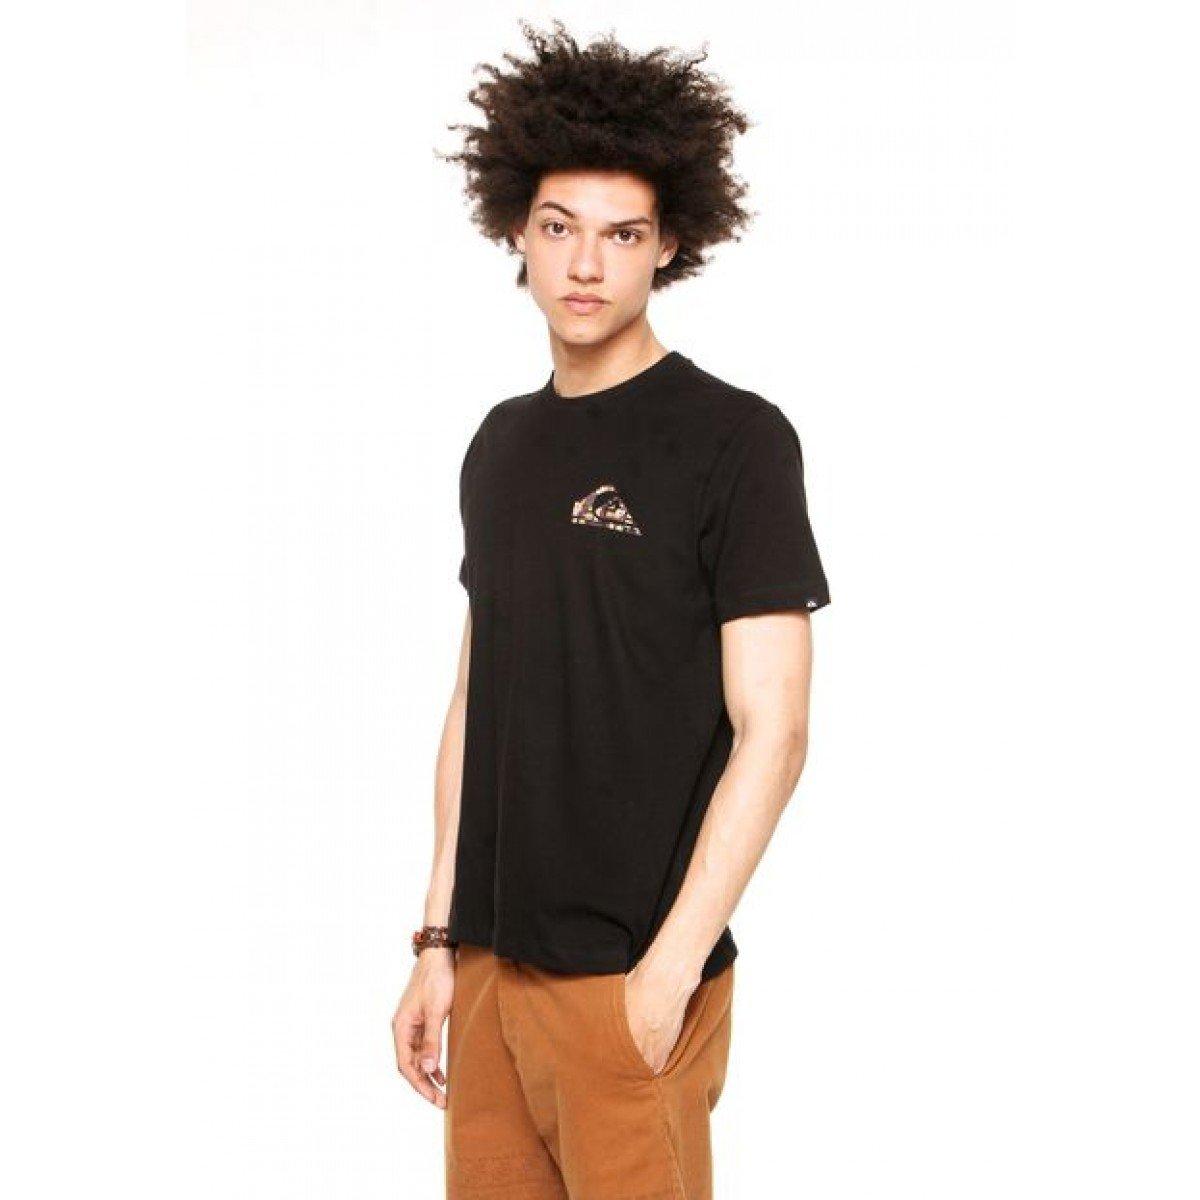 Camiseta Quiksilver Recycled Dot - Preta